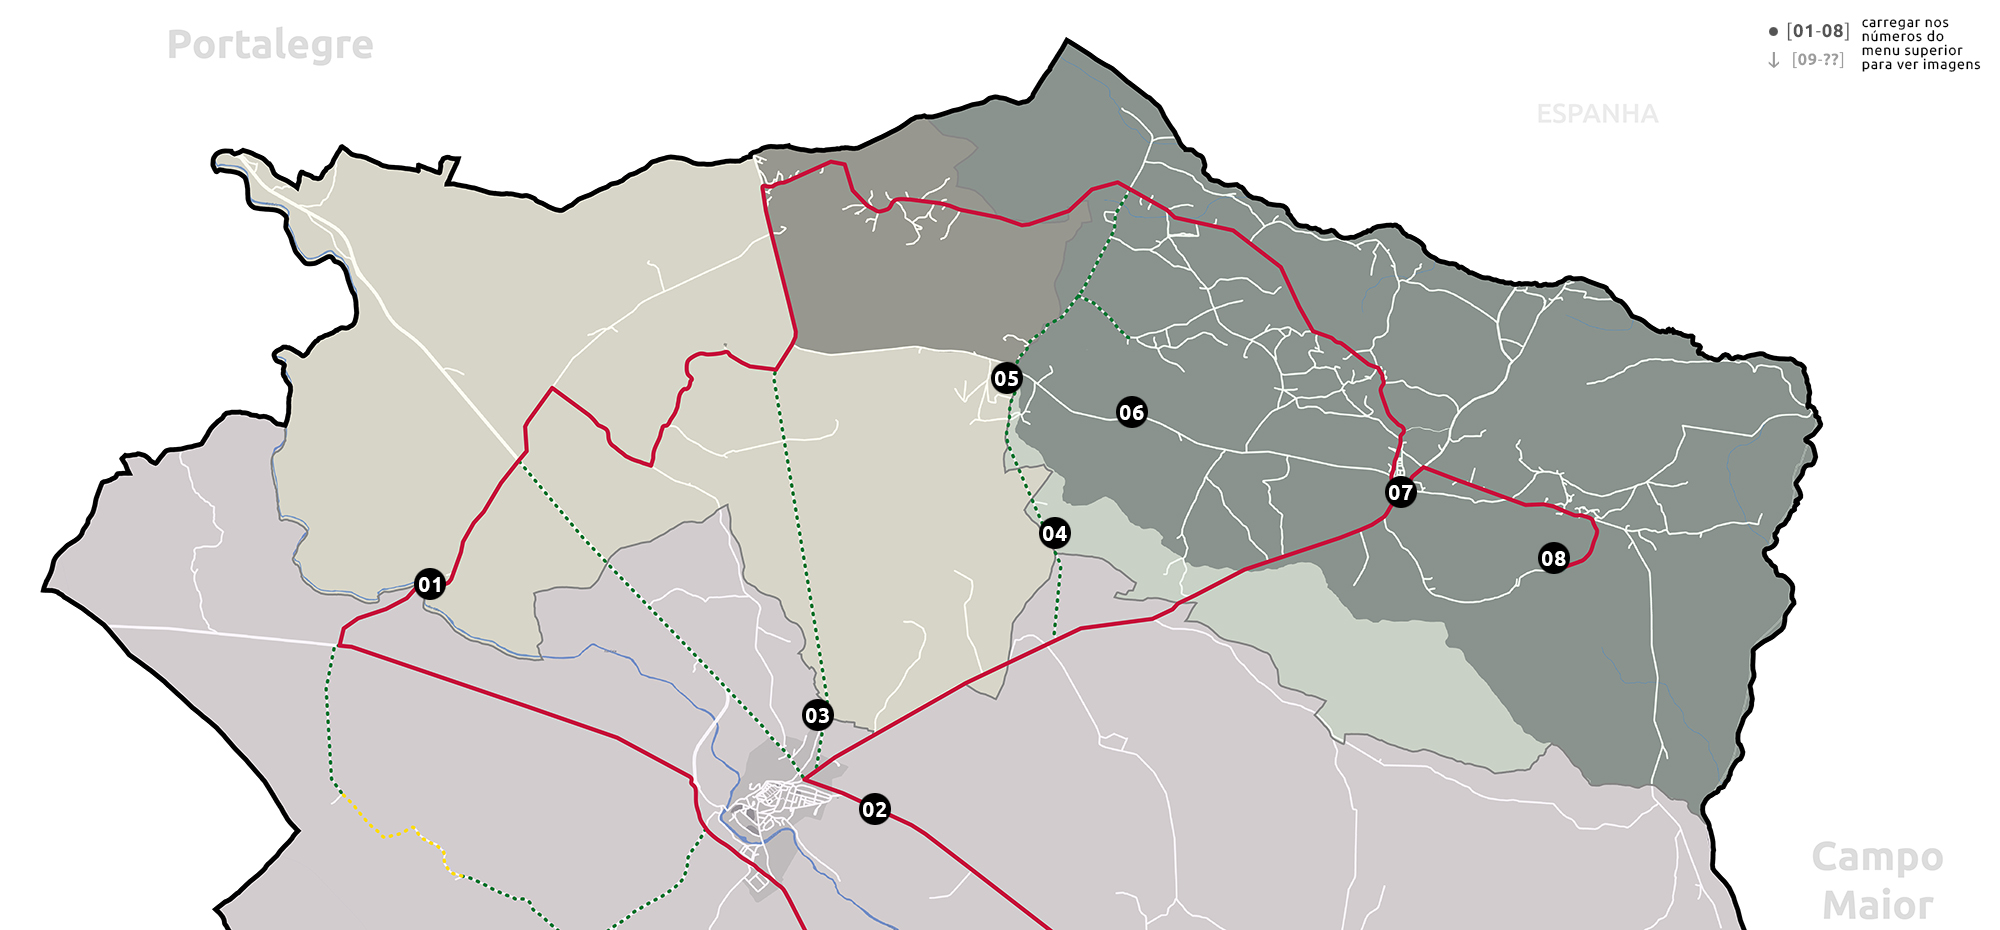 mapa_aumentado_2000x930_arronches_140716-01